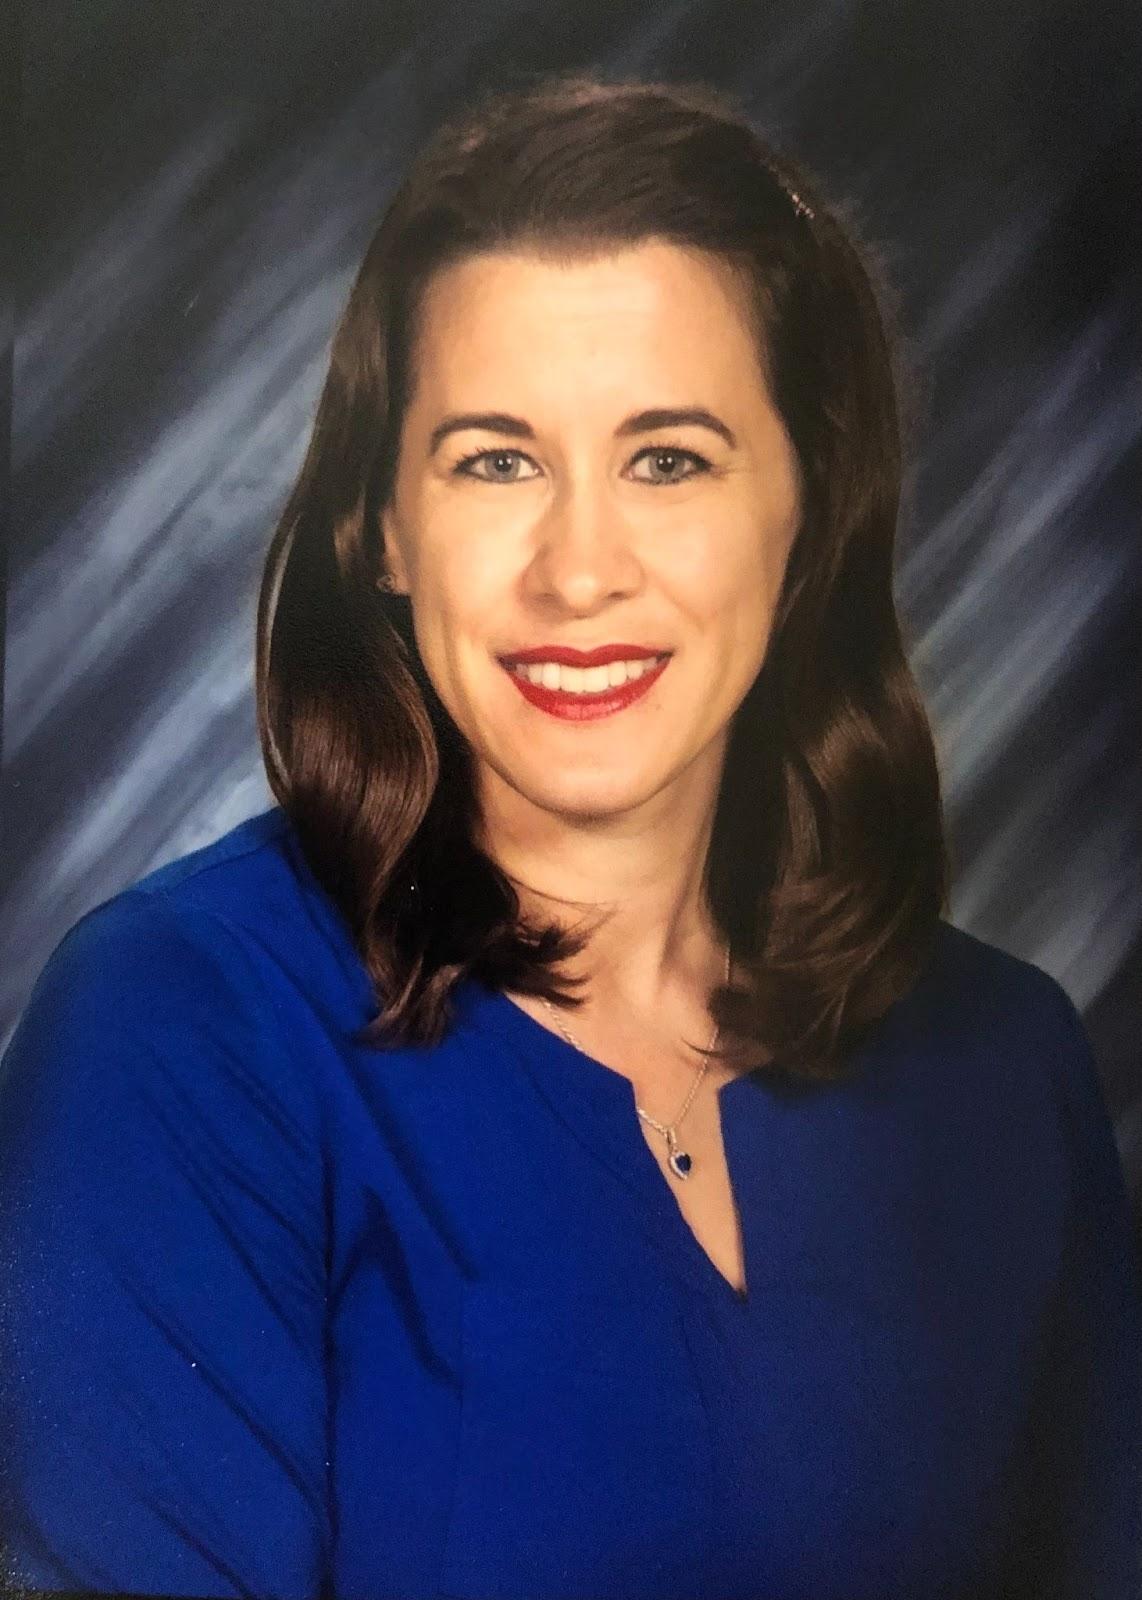 UNLV Alumna Tina Parkes